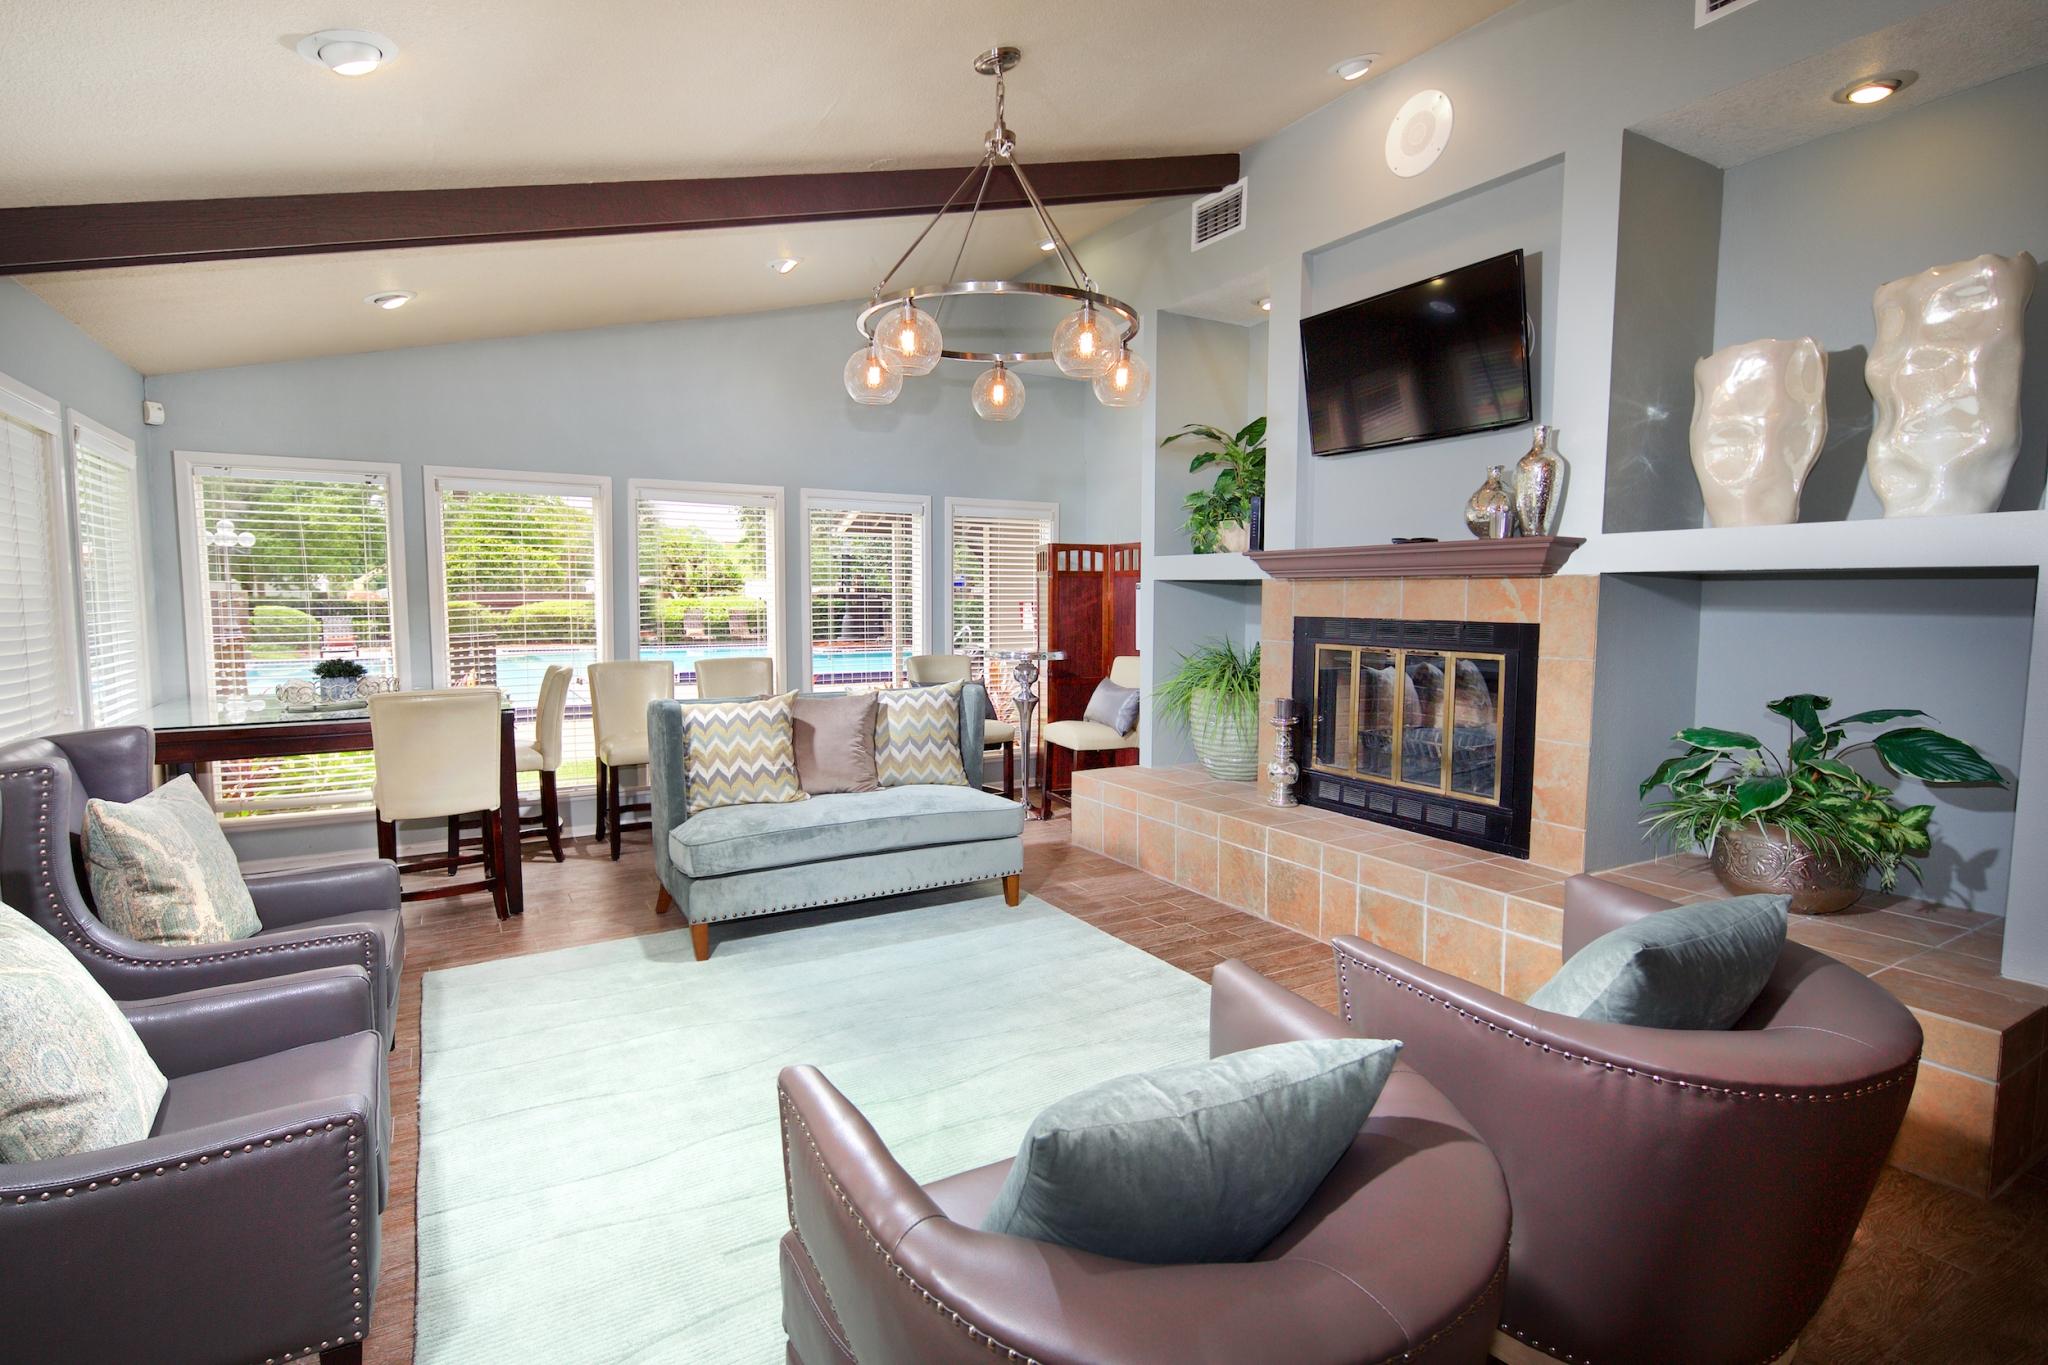 bentley green apartments for rent in jacksonville fl